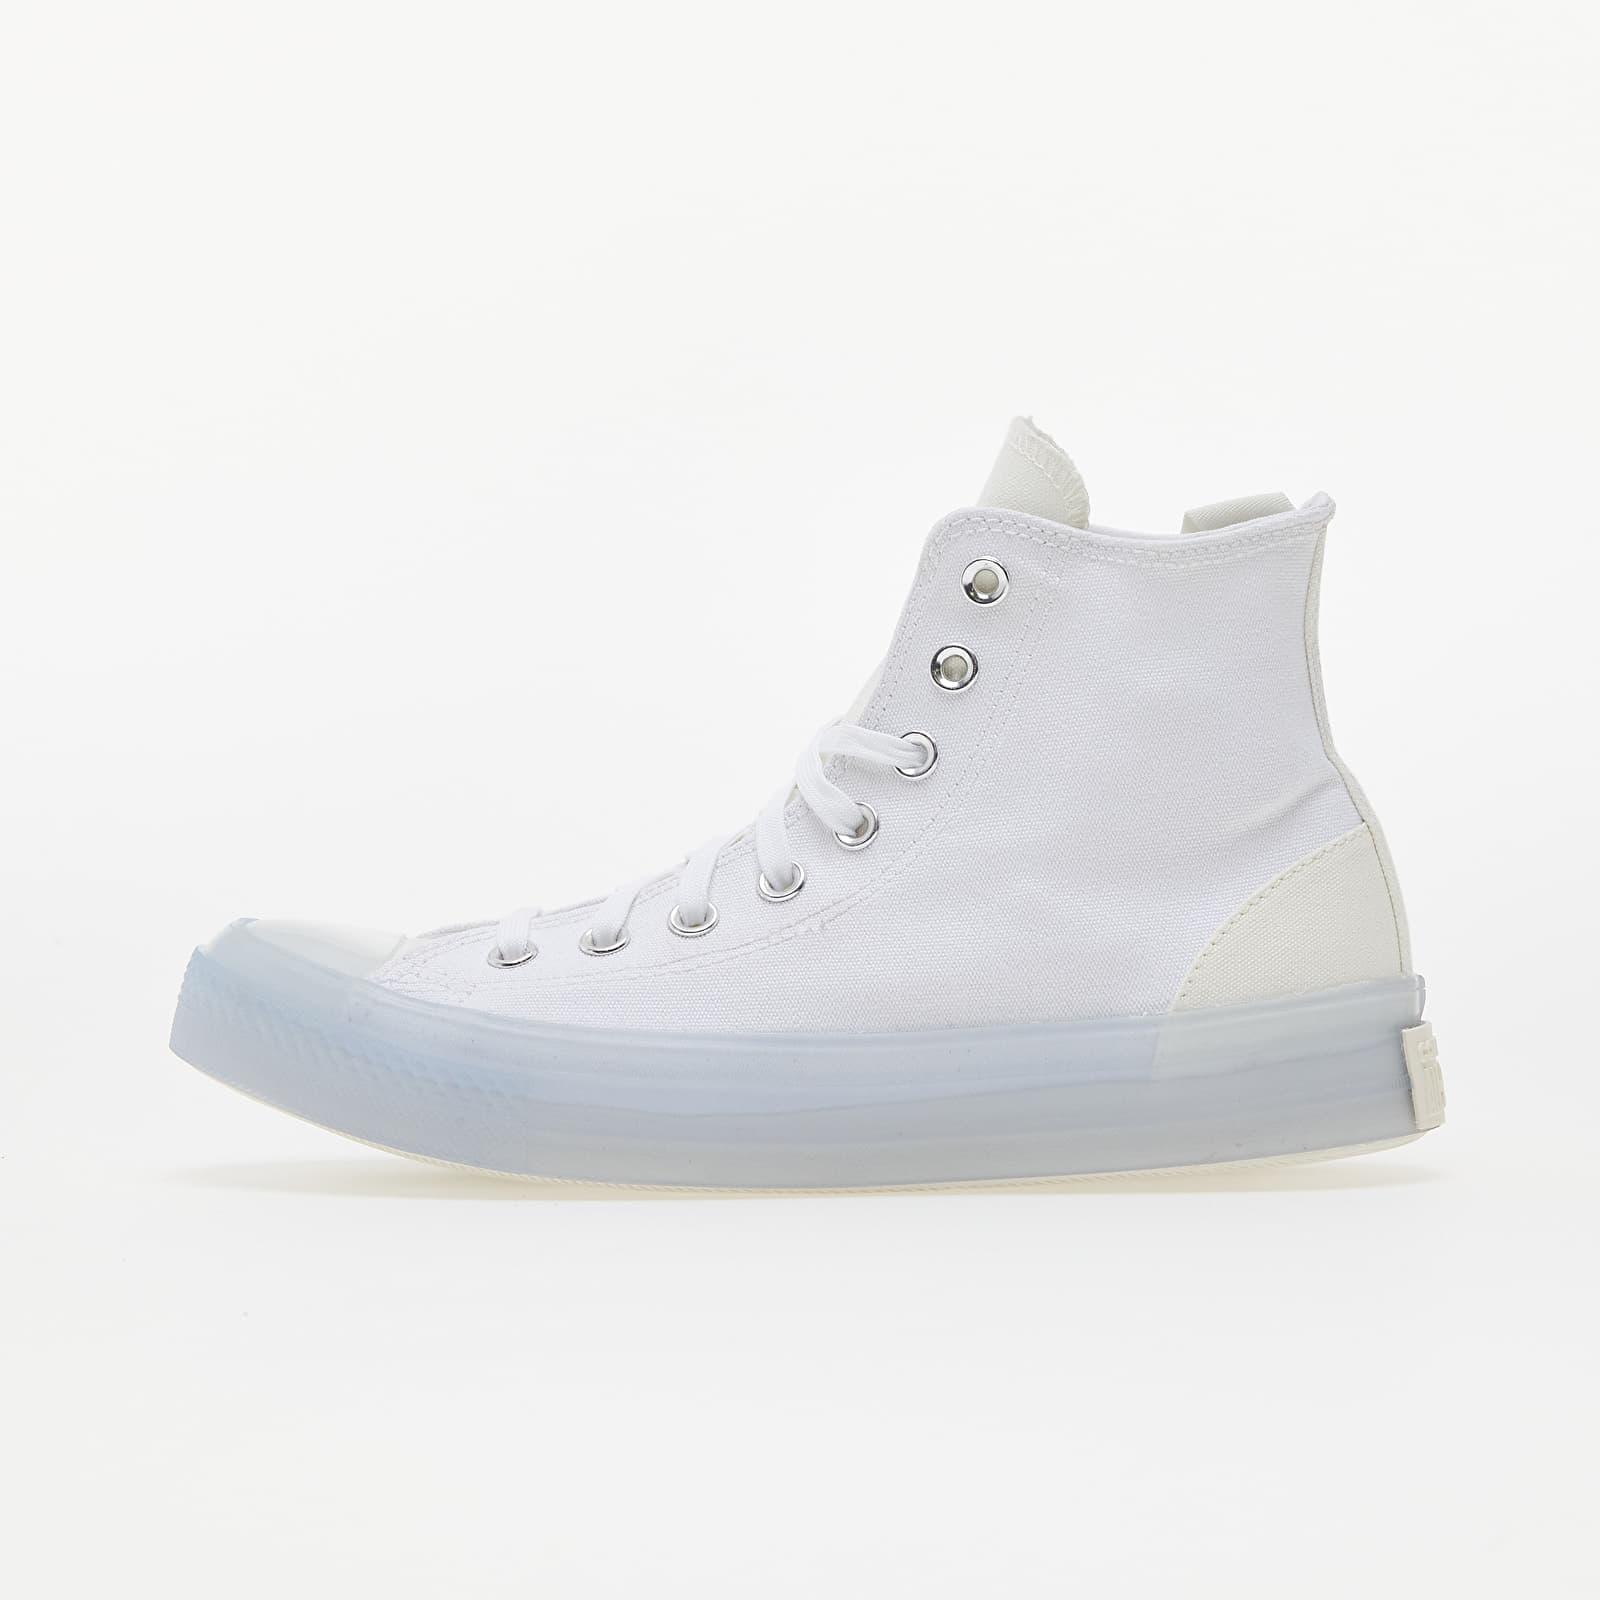 Converse Chuck Taylor All Star CX White/ Egret/ White EUR 42.5